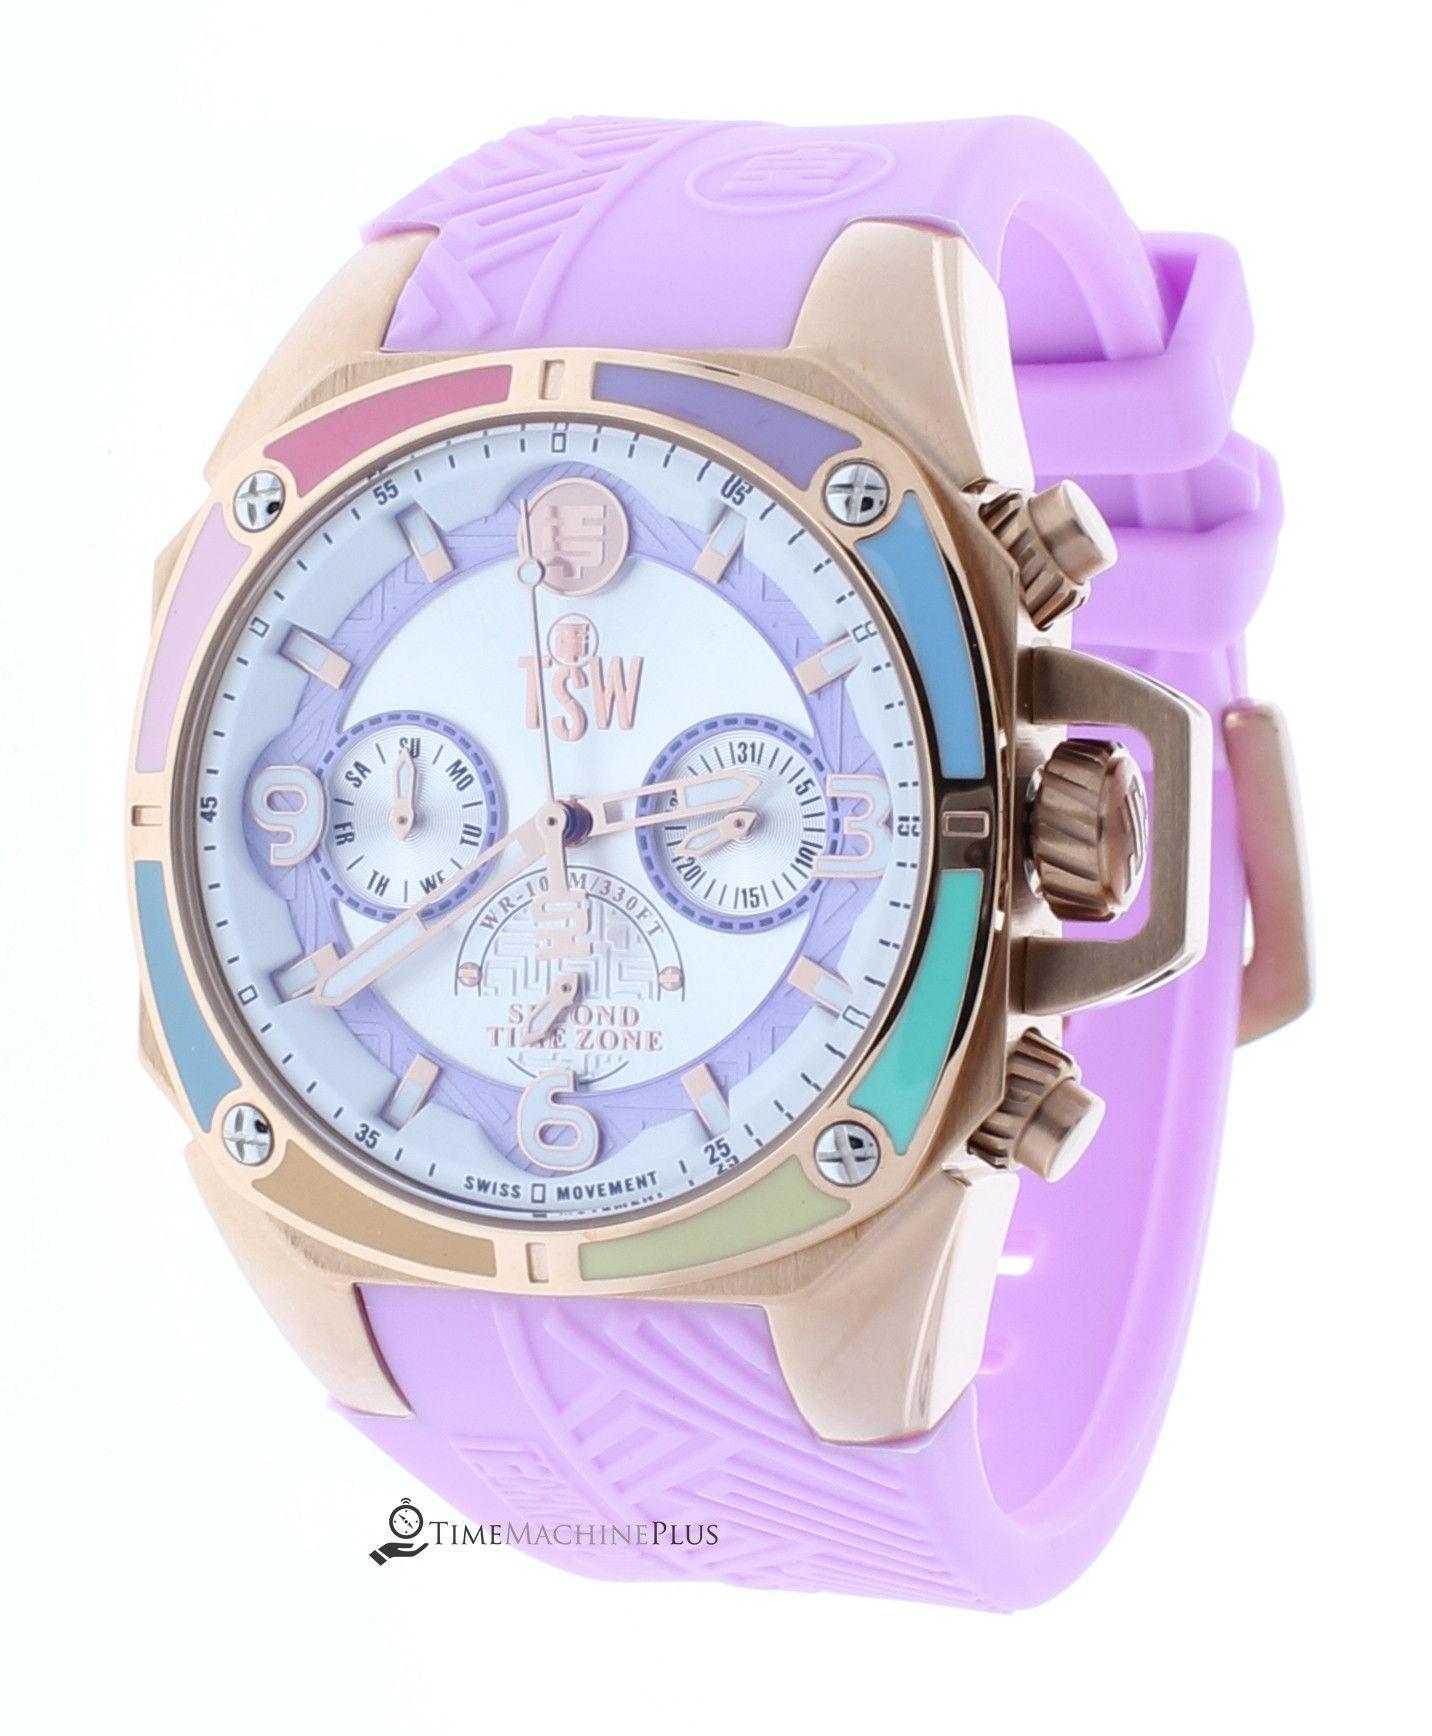 3eb86b547a8d88 Technosport TS-100-LIFES39 Women's Watch Light Pink Strap Swiss  Multifunction Movement